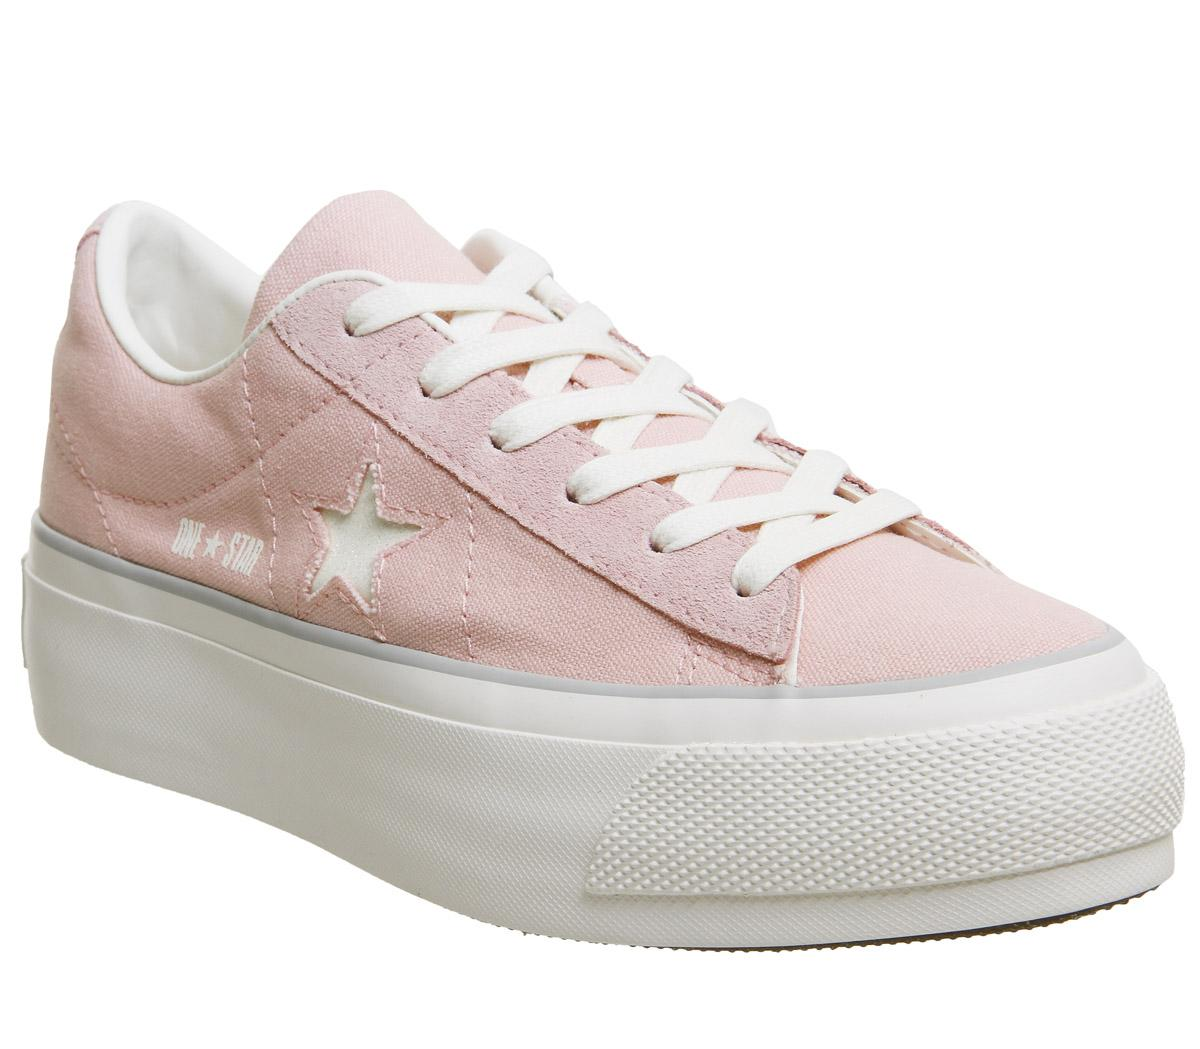 Converse All Star Low Platform Pink